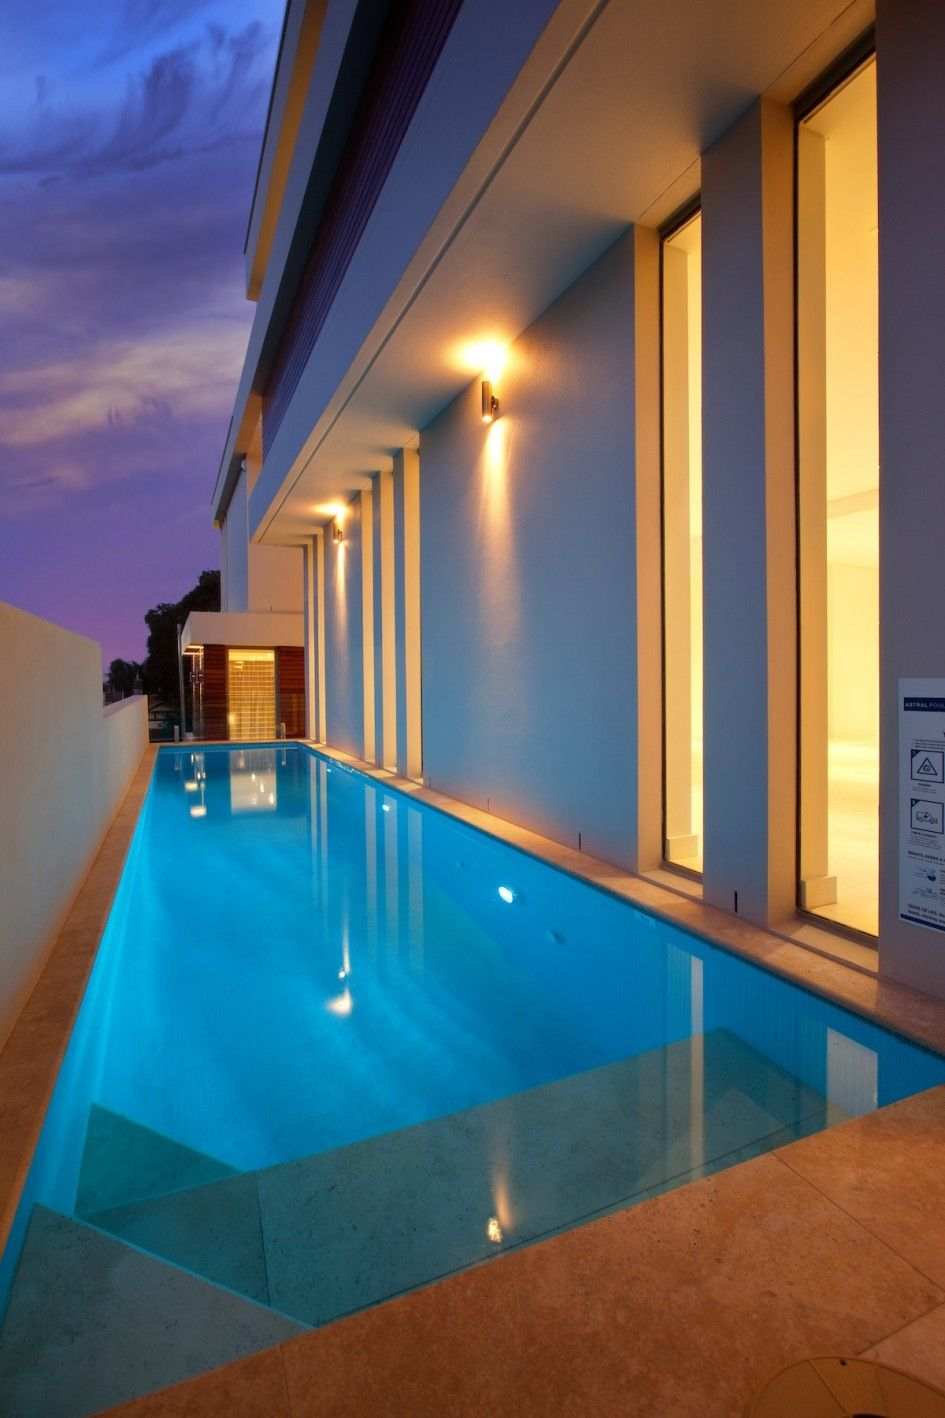 swimming pool Luxury And Minimalist Lap Pool Design Ideas How to ...